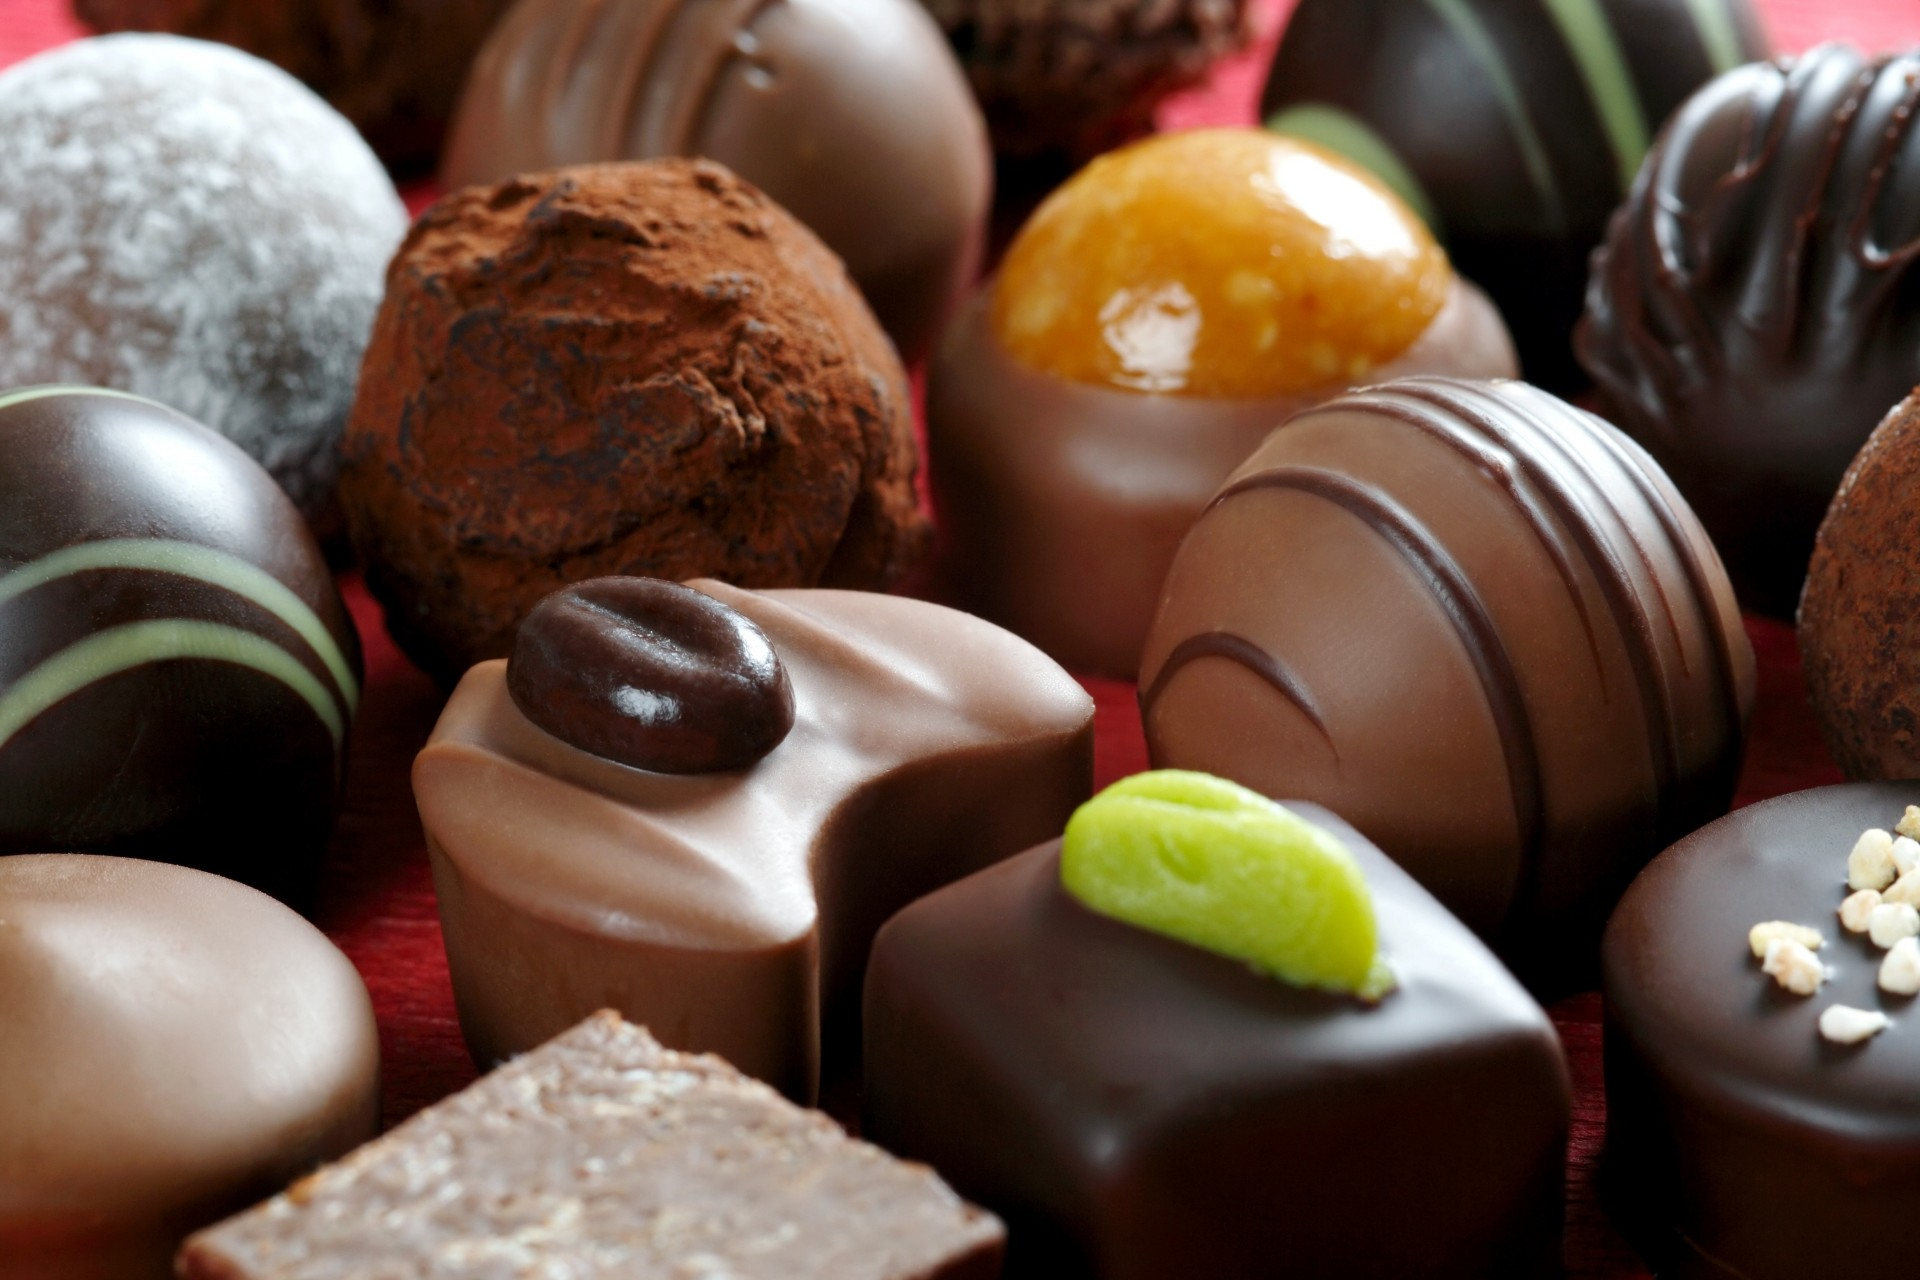 Красивые конфеты фото, зубик картинка